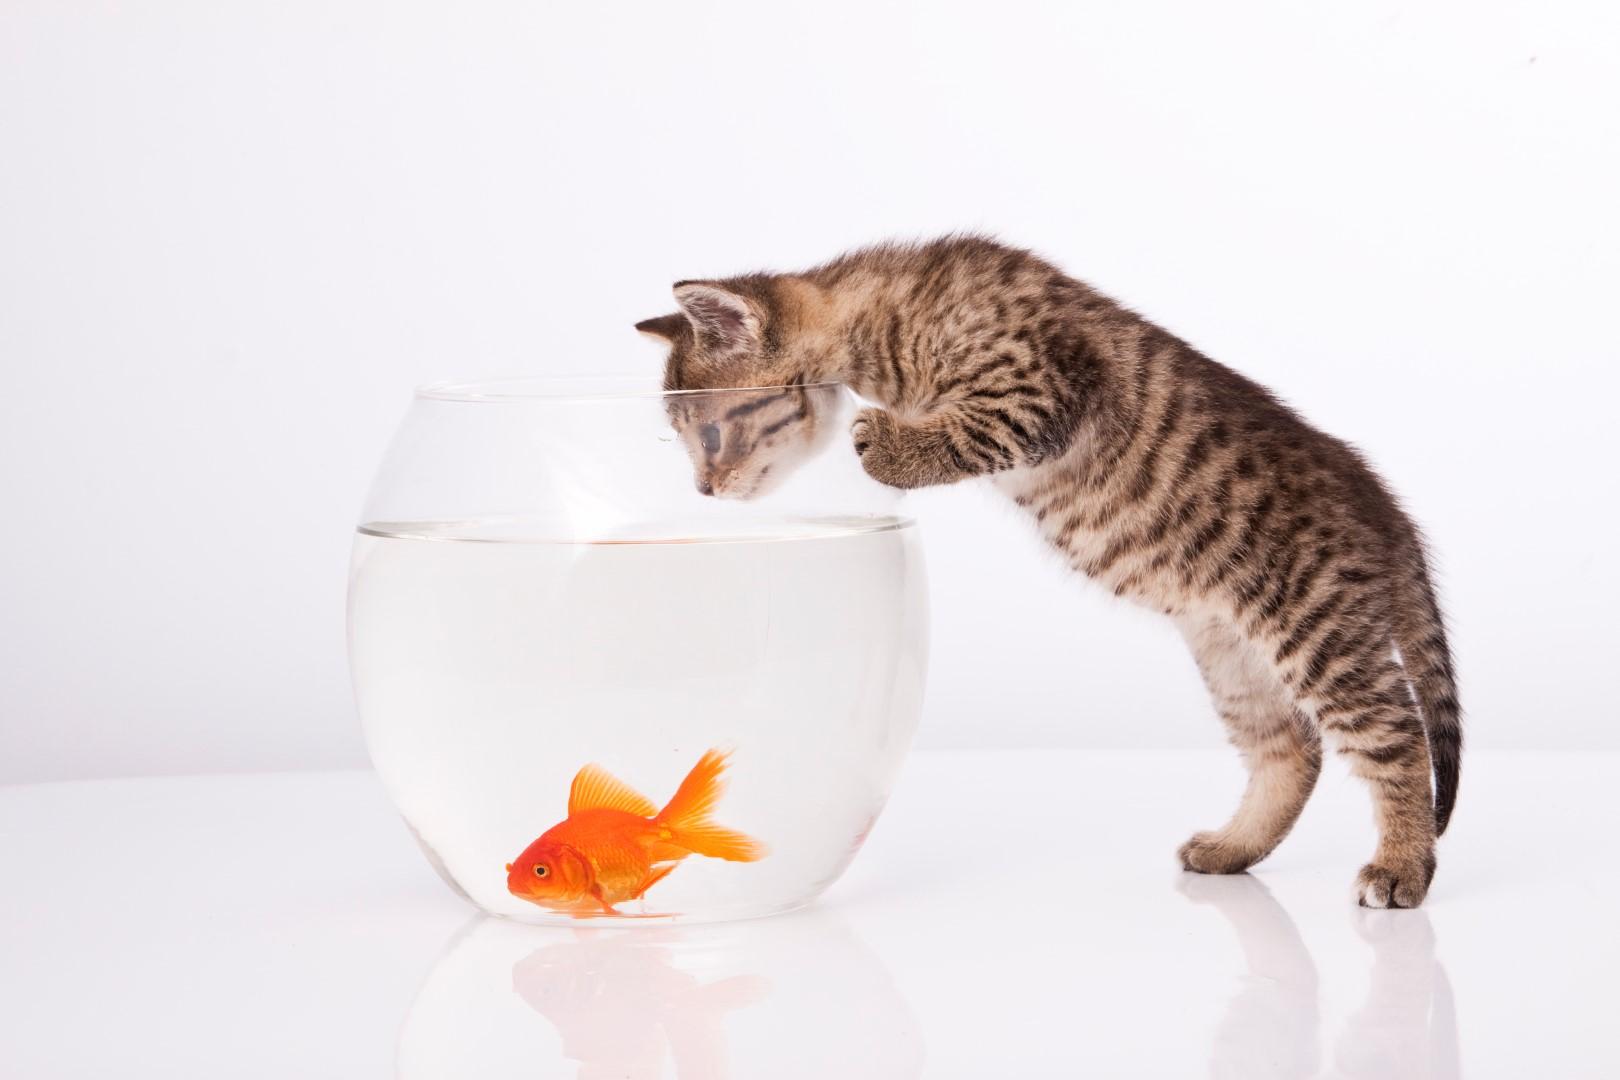 Cat-Looking-At-Goldfish.jpg